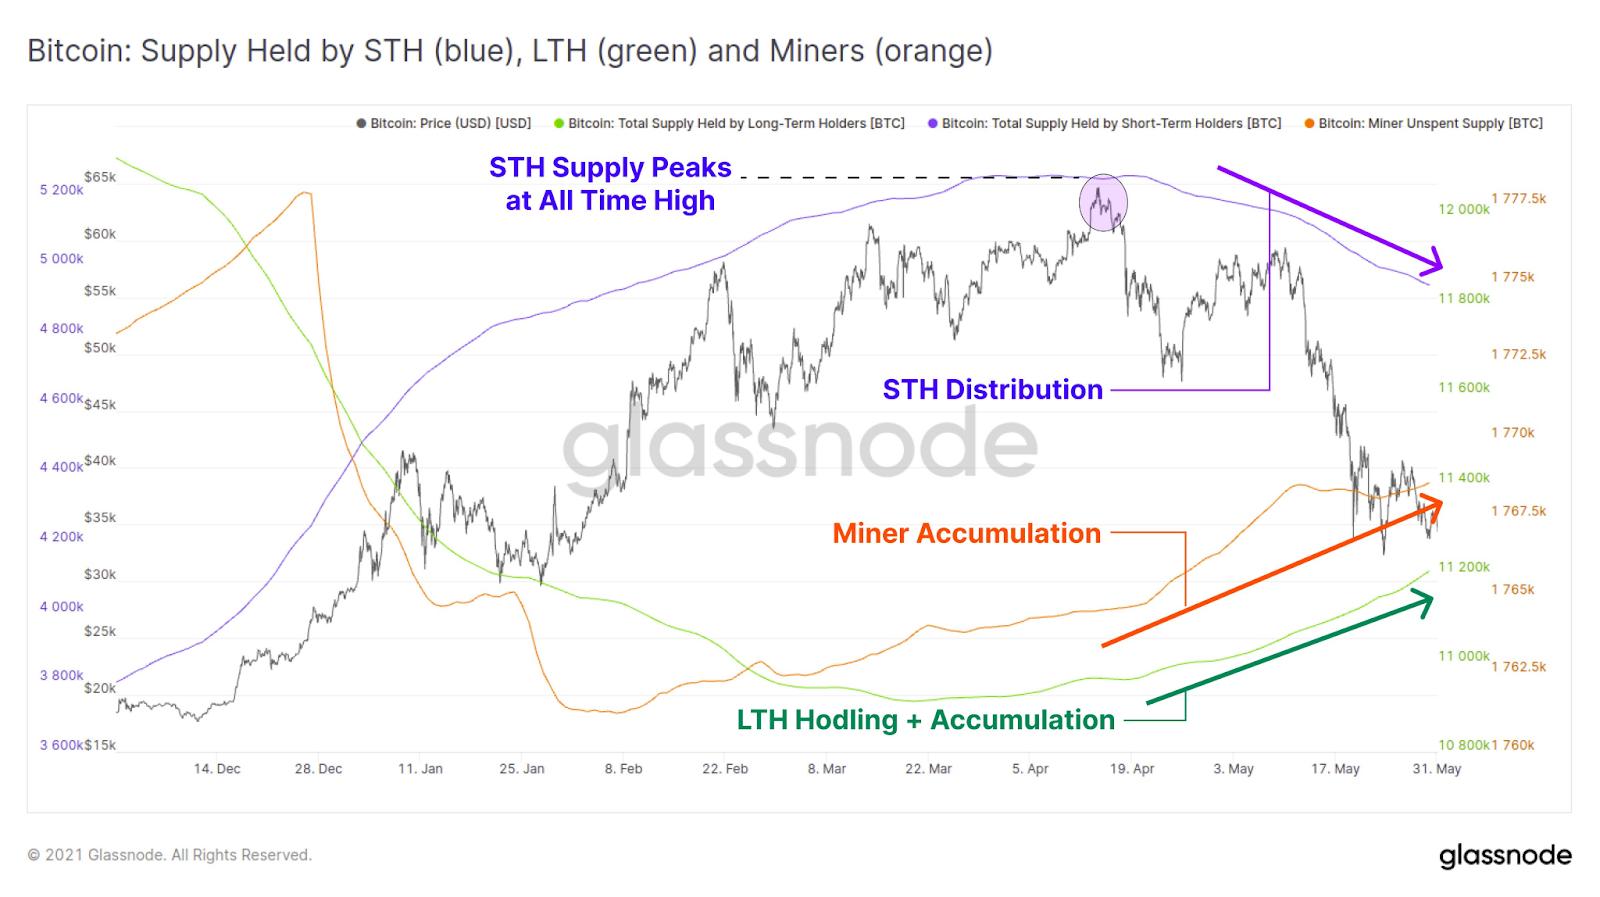 Glassnode Bitcoin Report